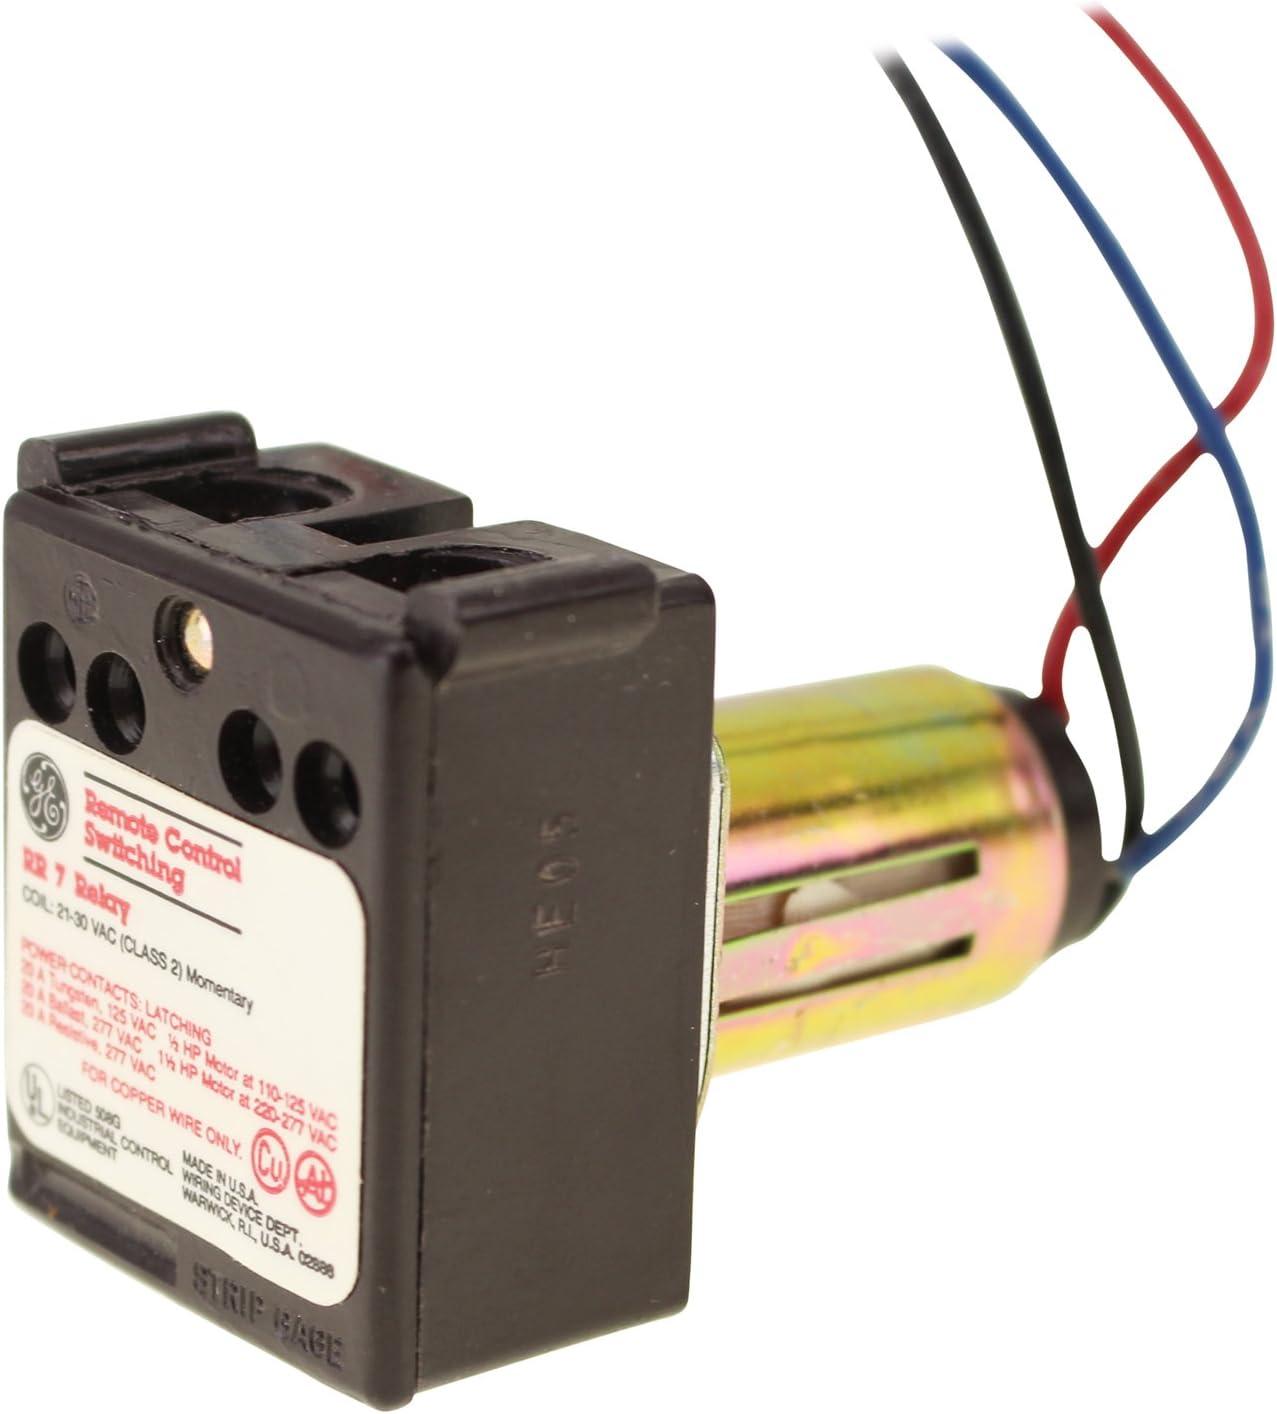 33 Ge Rr7 Relay Wiring Diagram